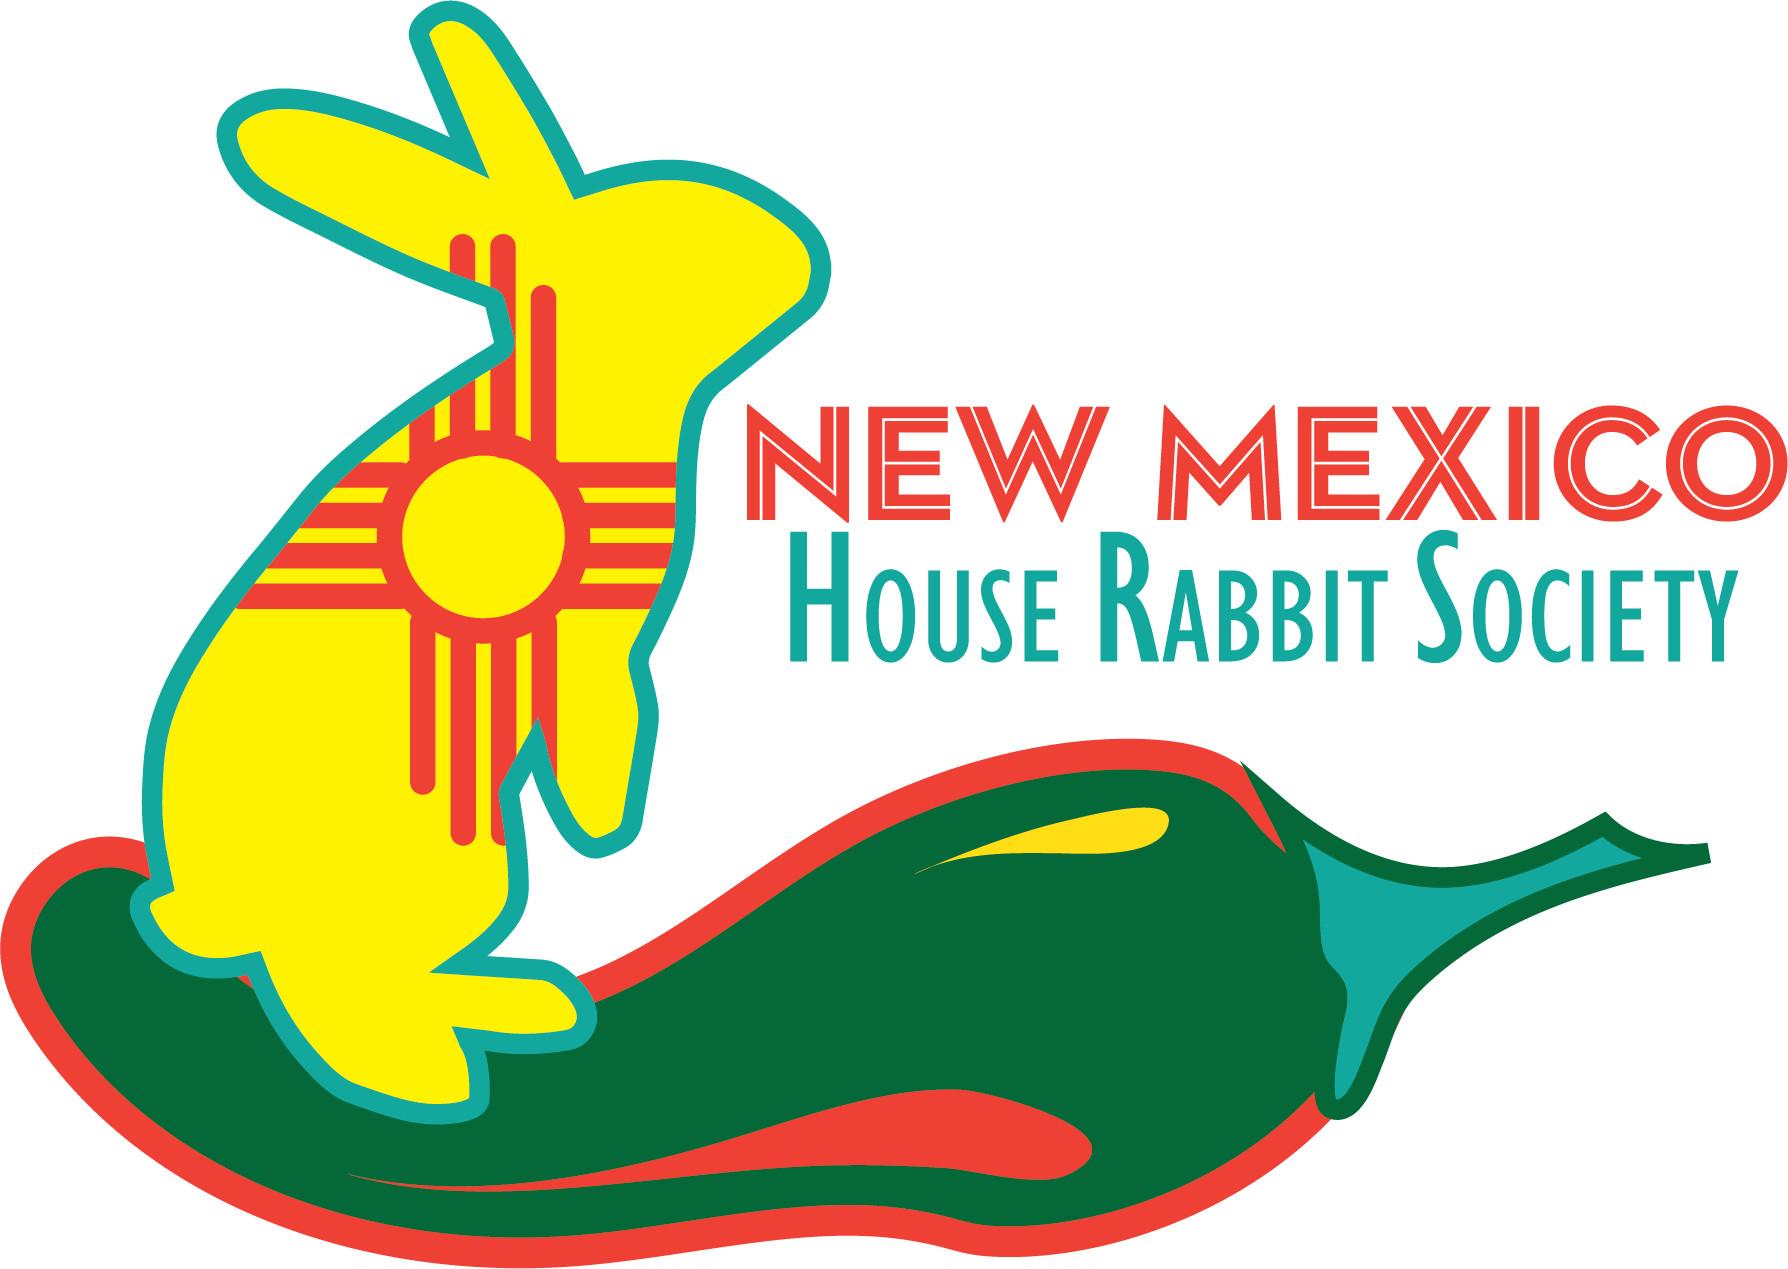 House Rabbit Society NM